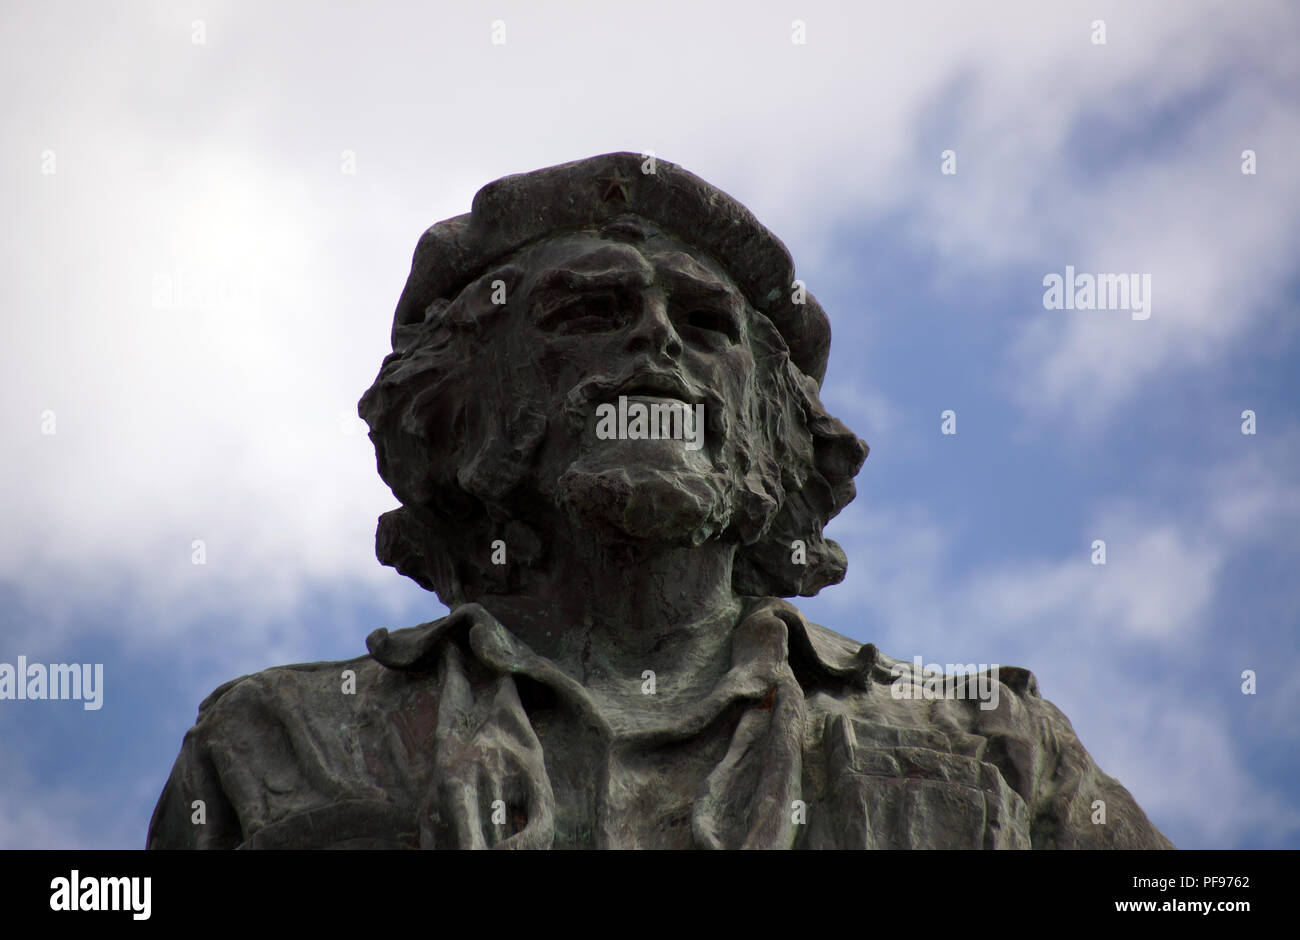 Che Guevara Monument in Santa Clara, Cuba - Stock Image